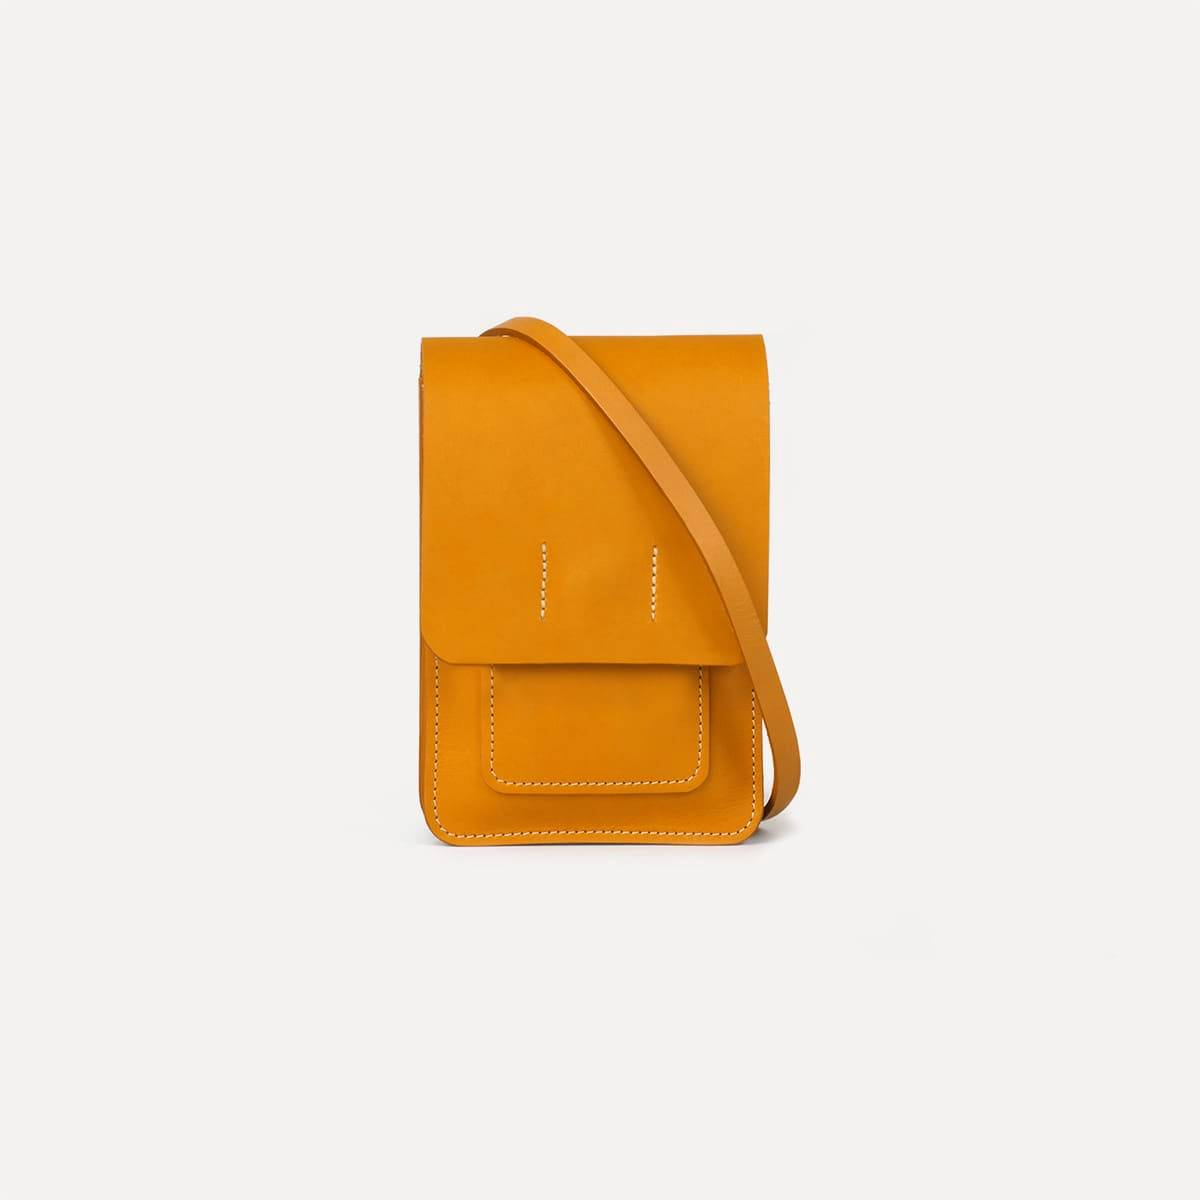 Jeweler's bag - BDC x Atelier Paulin (image n°1)